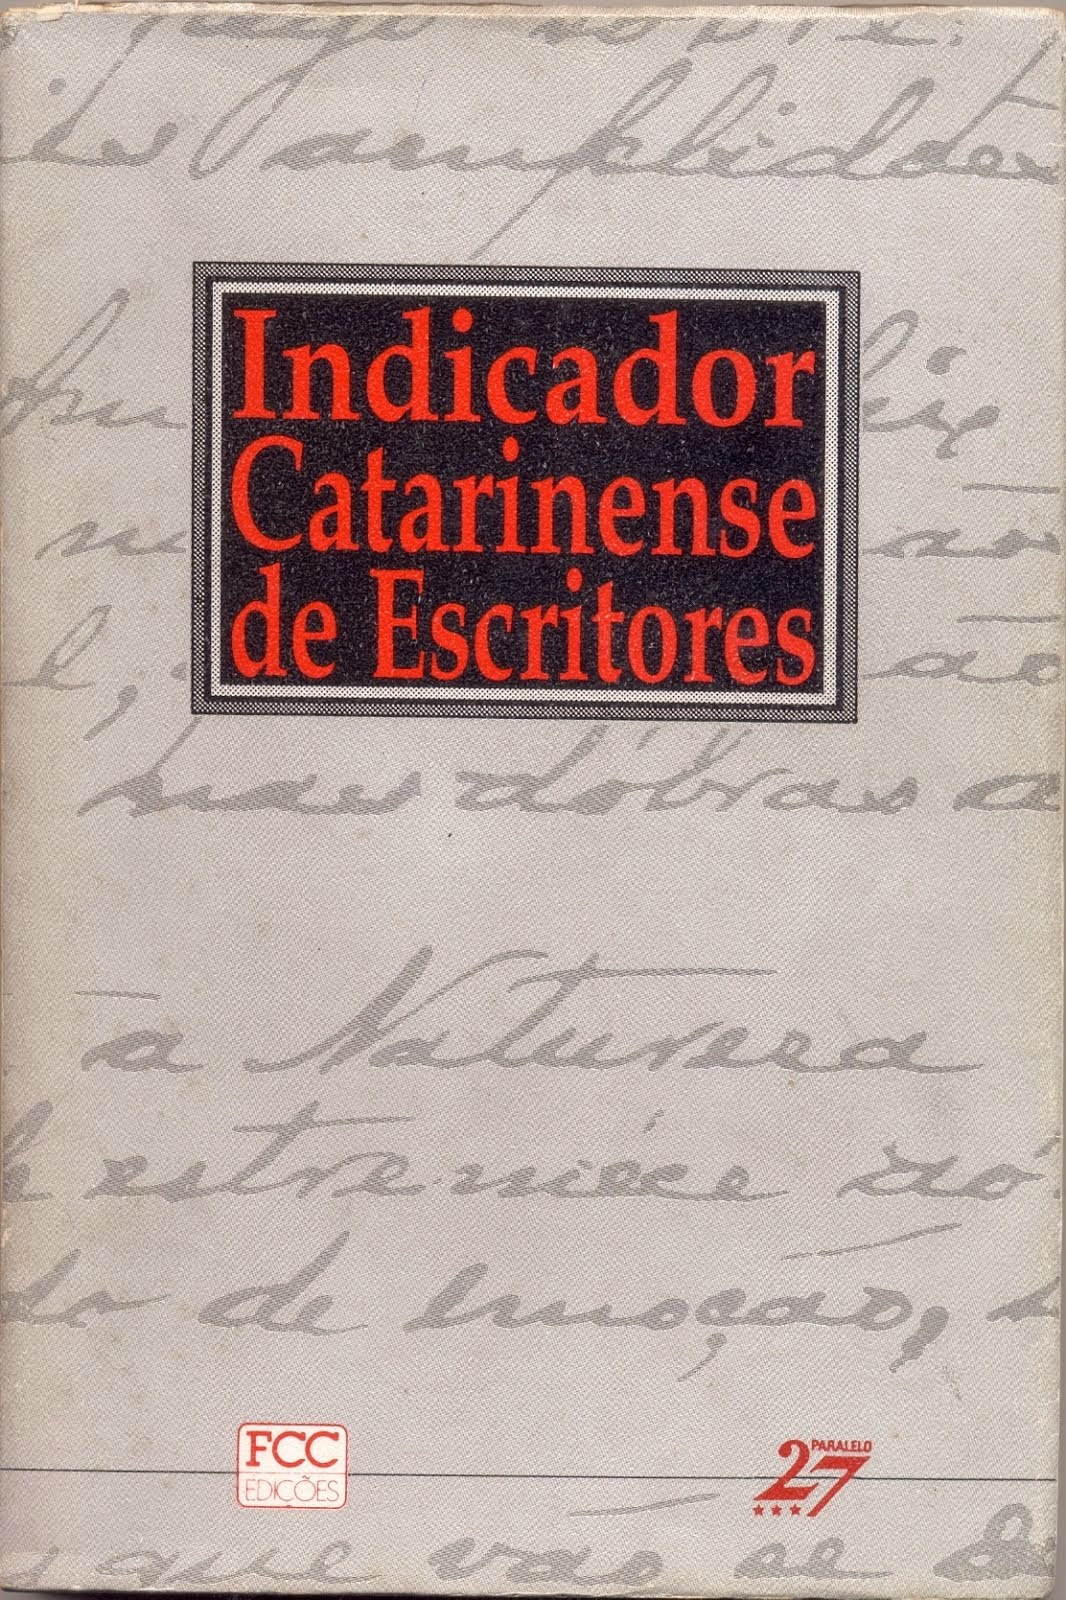 INDICADOR CATARINENSE DE ESCRITORES (FCC EDIÇÕES/PARALELO 27/1993)